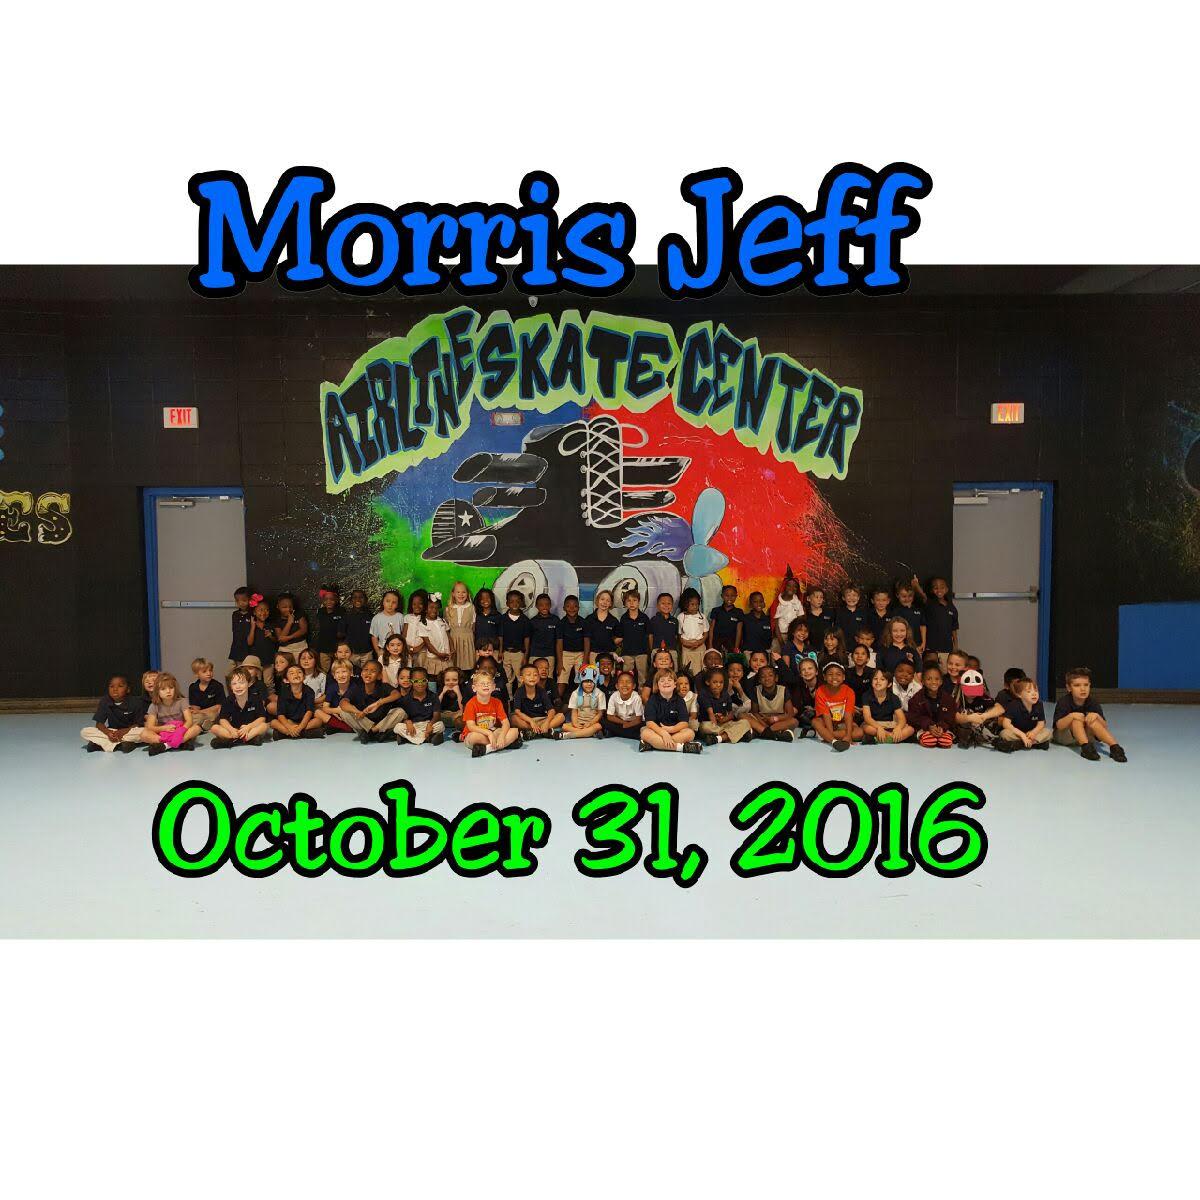 Morris Jeff